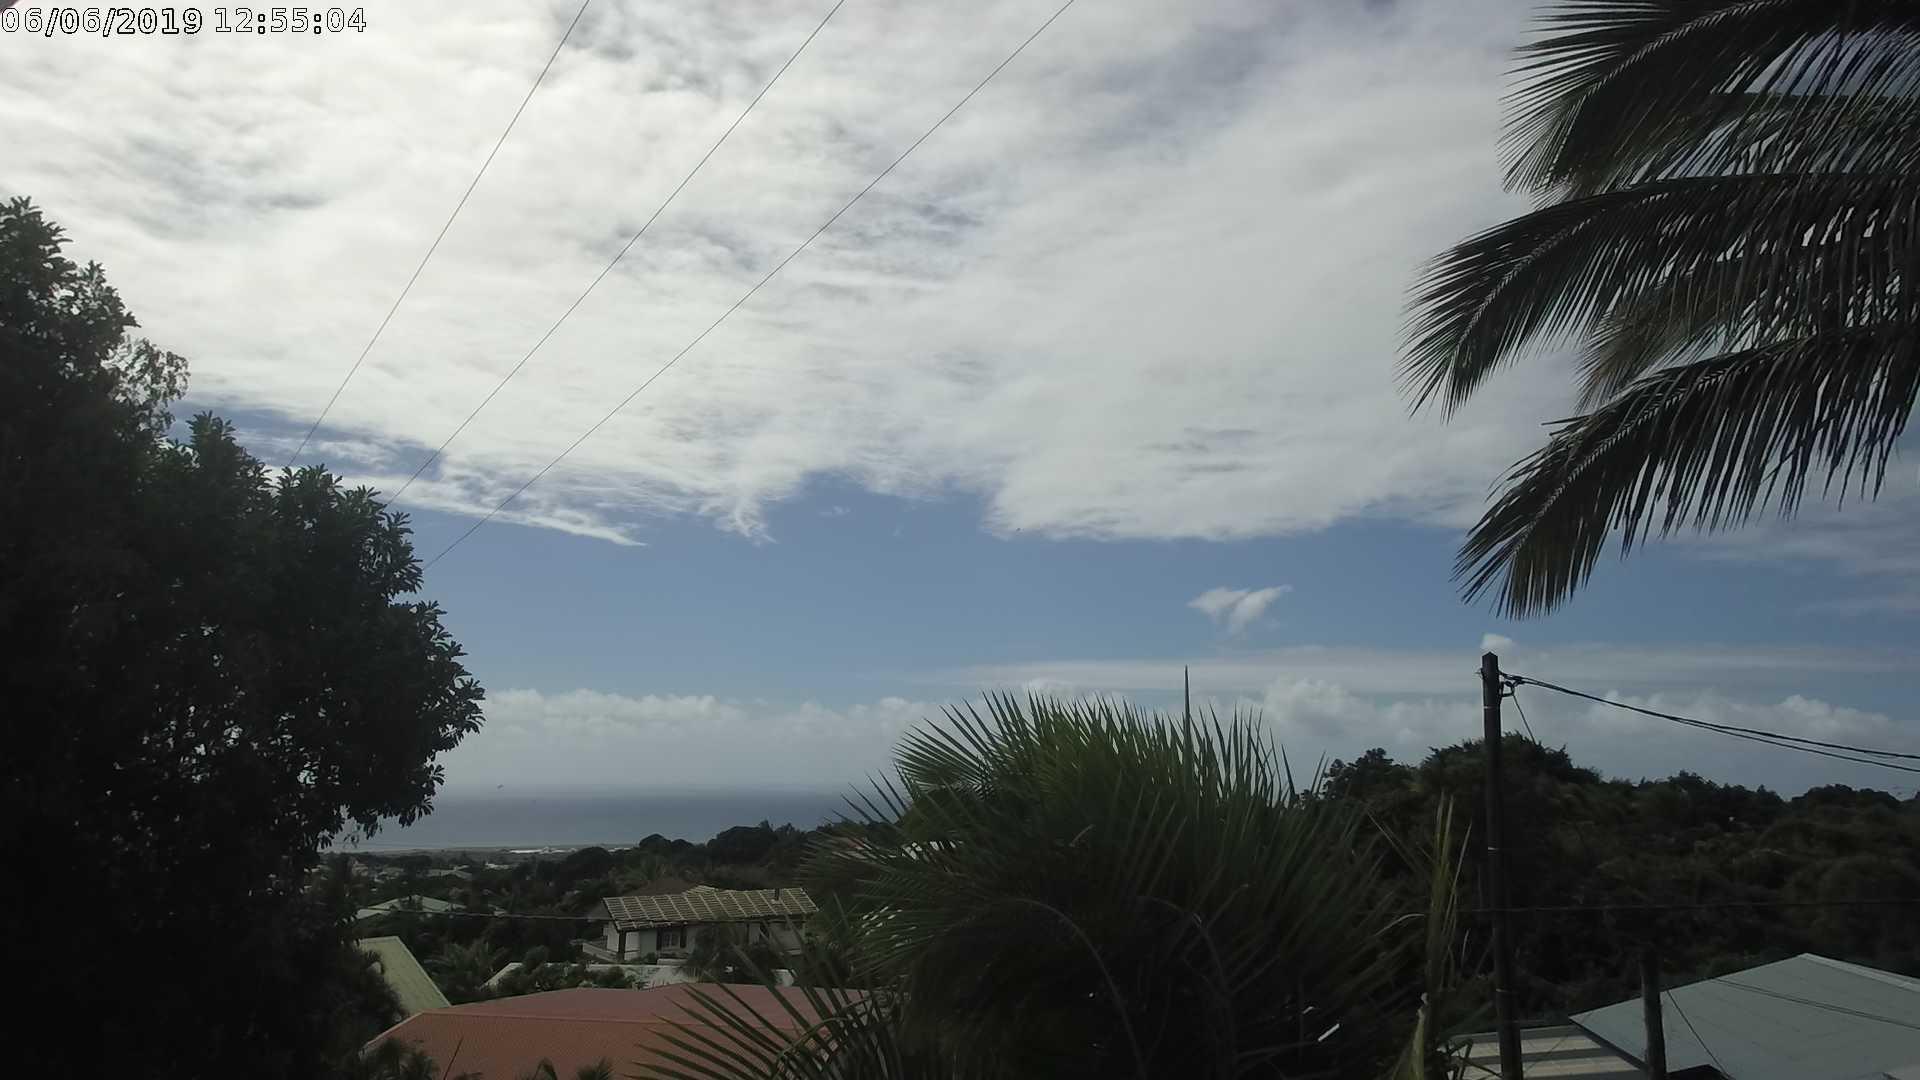 12h55: ciel du nord de l'île. CYCLOTROPIC